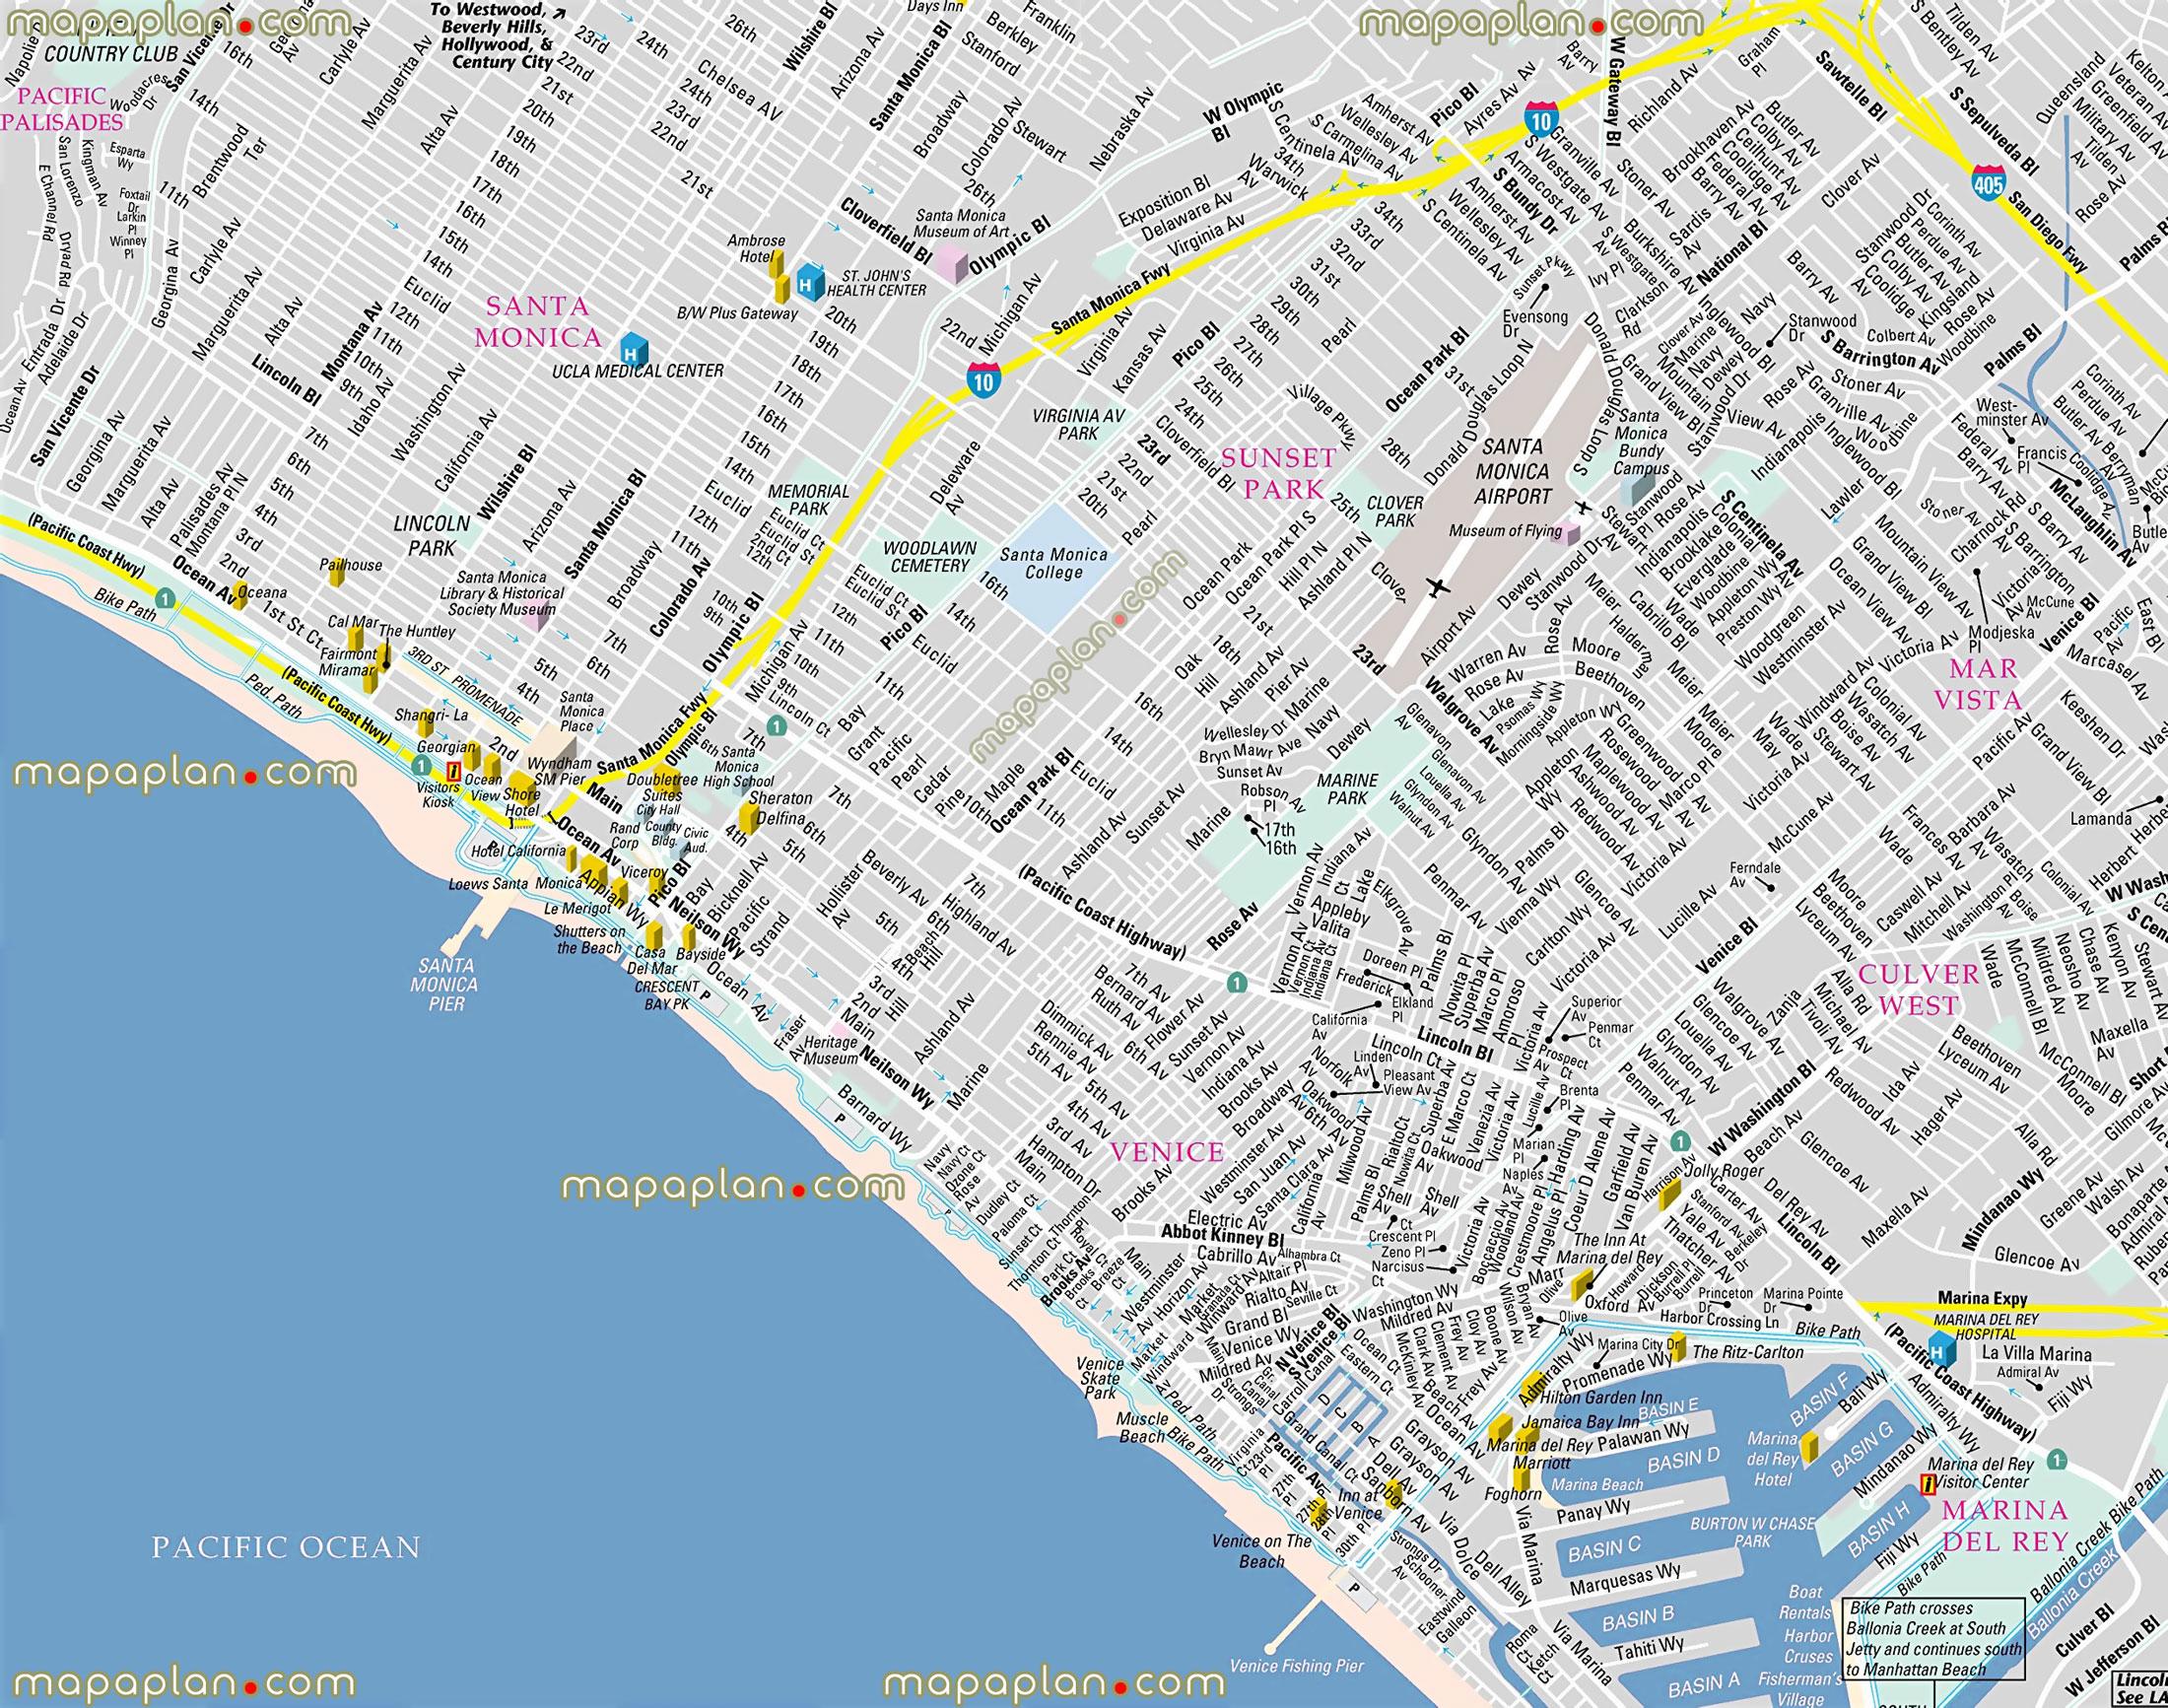 Los Angeles Top Tourist Attractions Map California Santa Monica - Venice Beach California Map